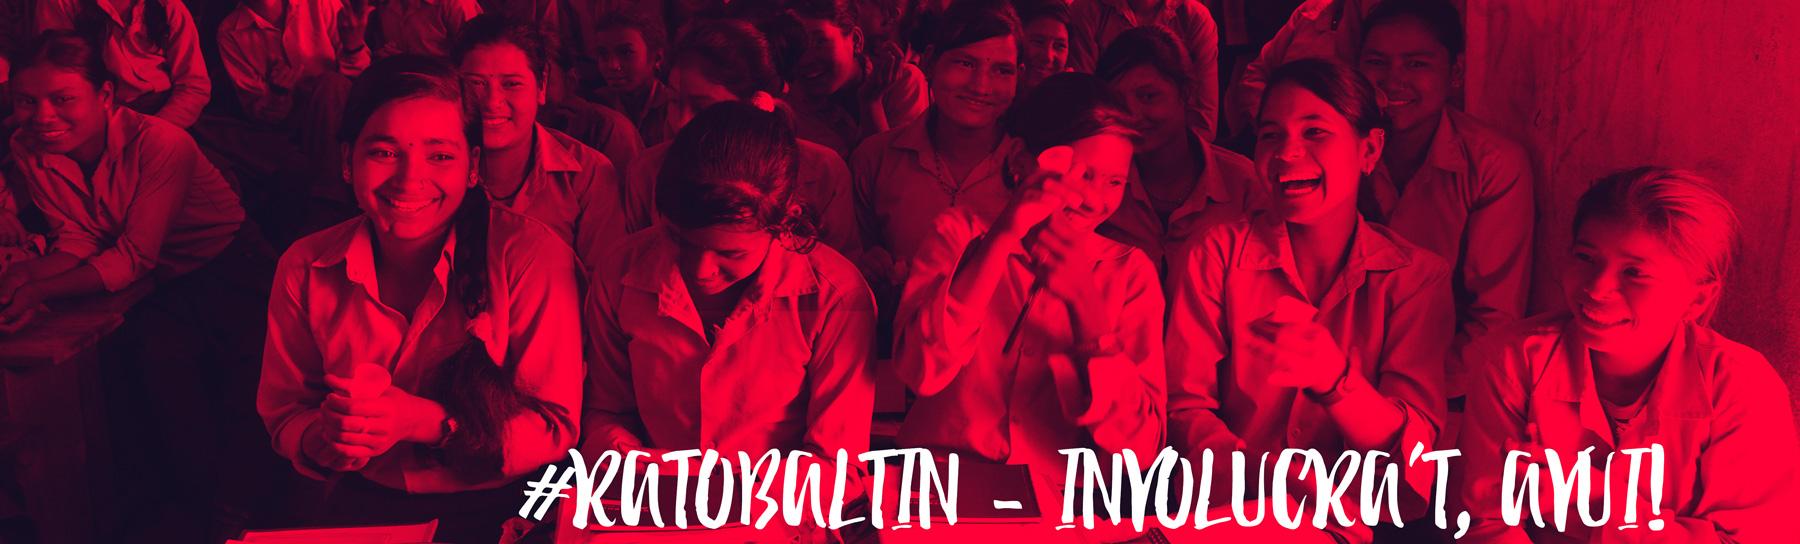 involucra't avui amb Rato Baltin Nepal